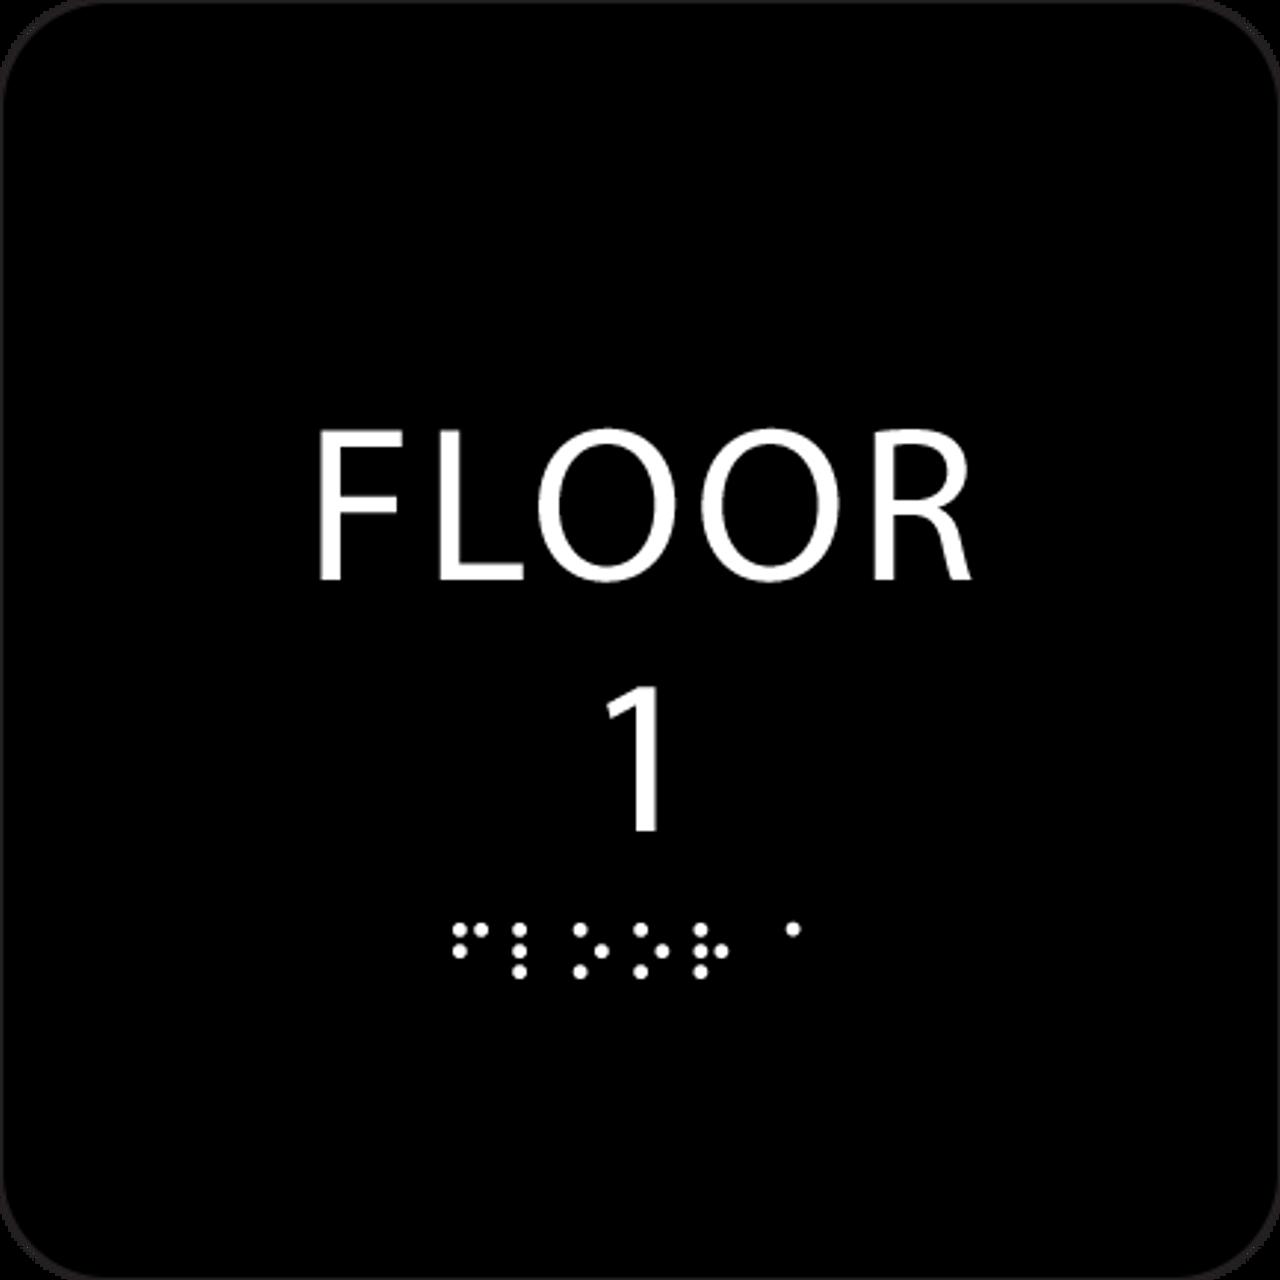 Black Floor 1 Identification Sign